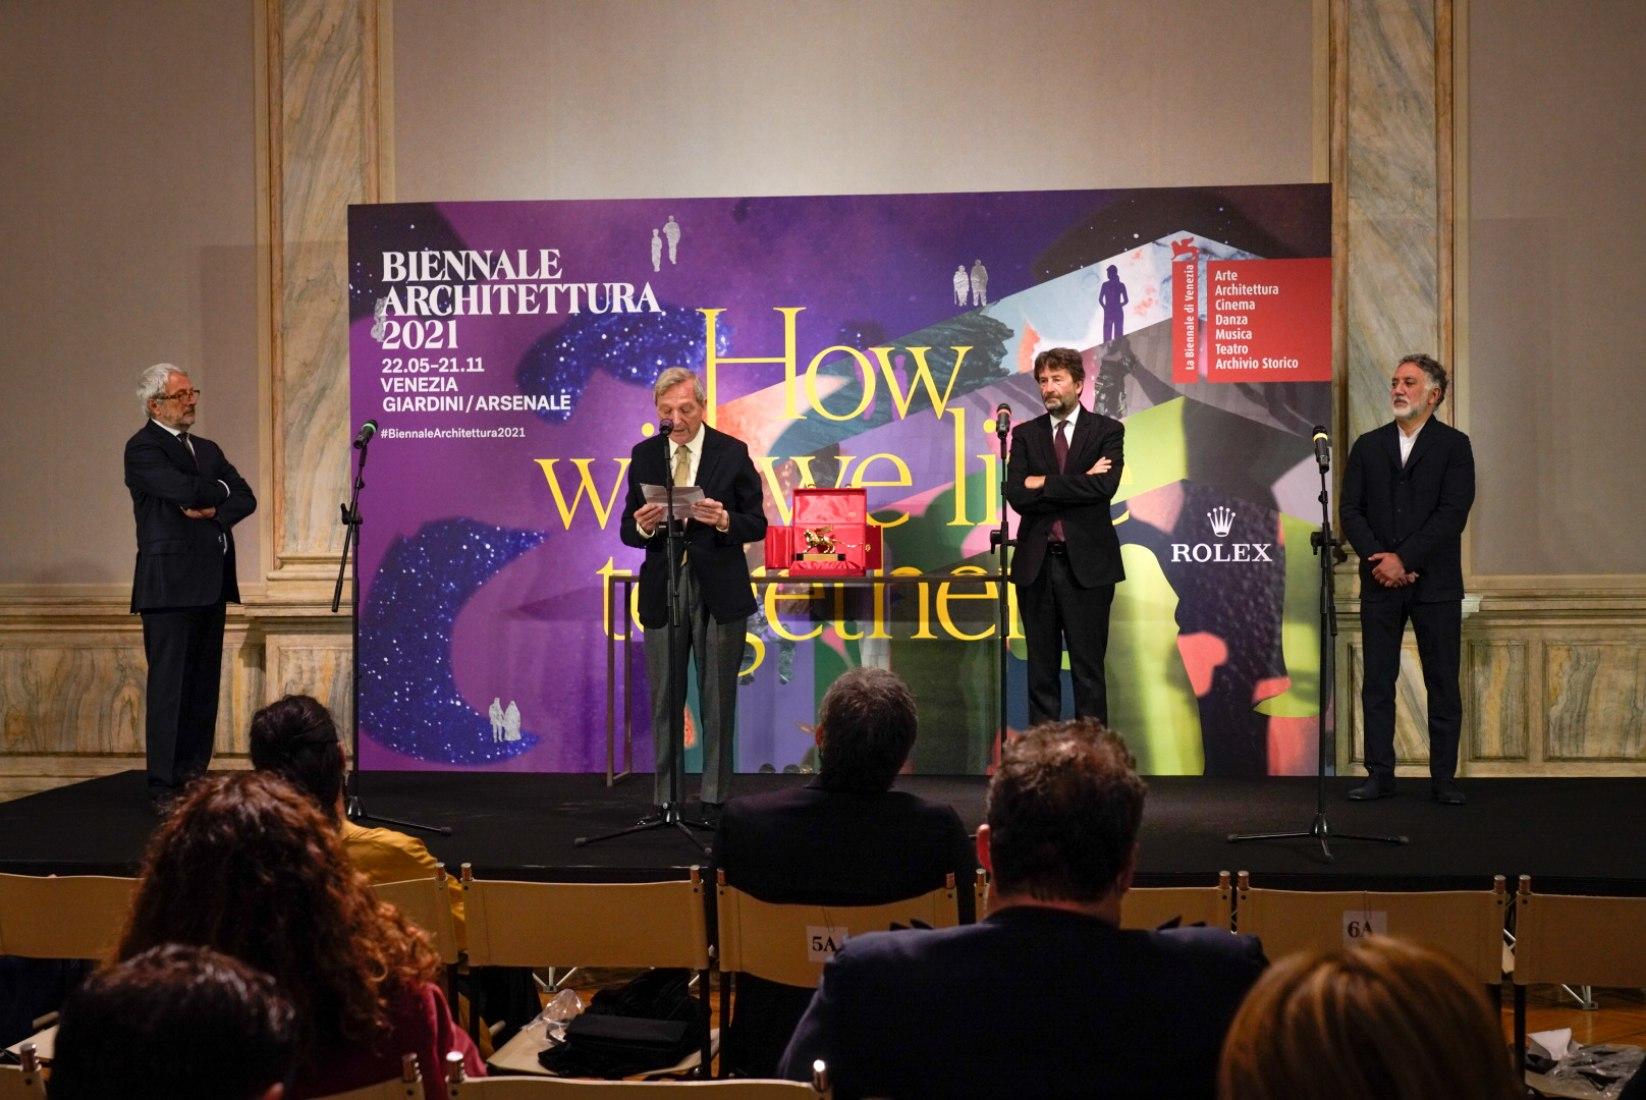 Rafael Moneo receives the Golden Lion for Lifetime Achievement of the Biennale Architettura 2021. Photograph by Andrea Avezzu